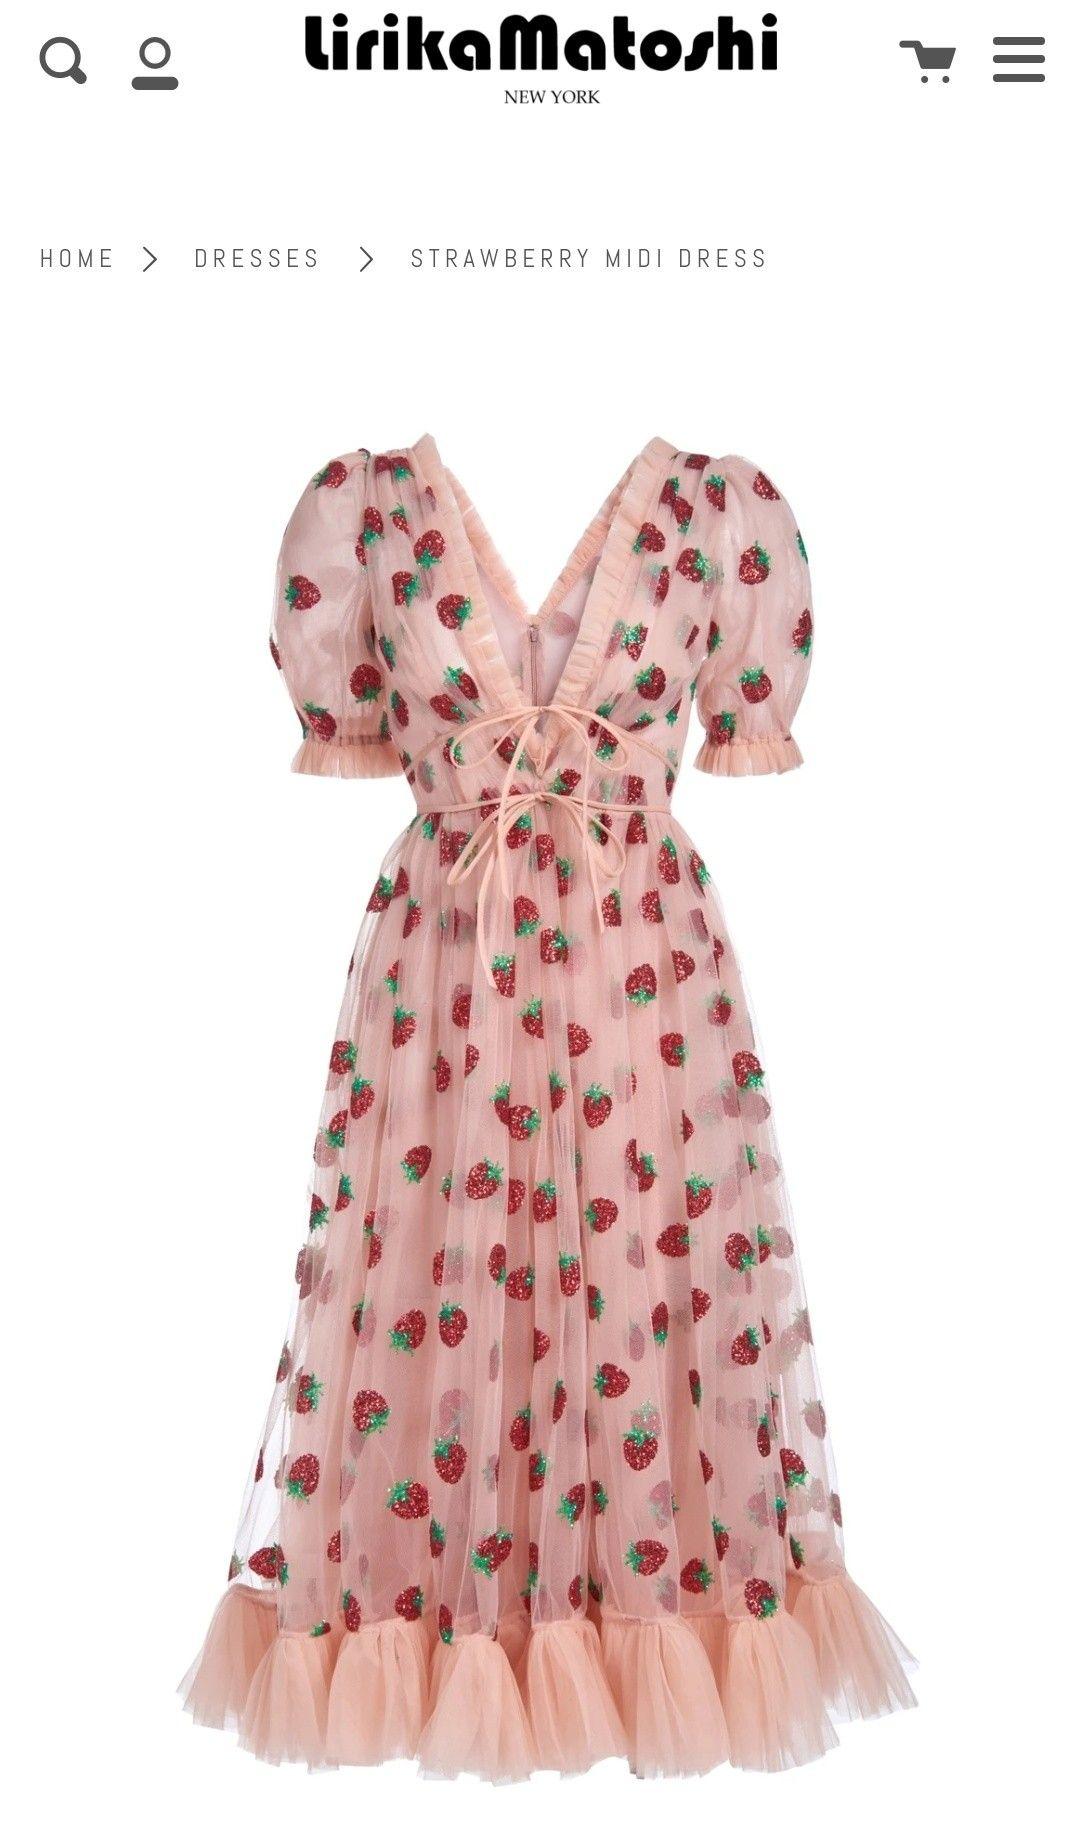 Strawberry Midi Dress In 2021 Dresses Strawberry Dress Pink Summer Dress [ 1842 x 1080 Pixel ]